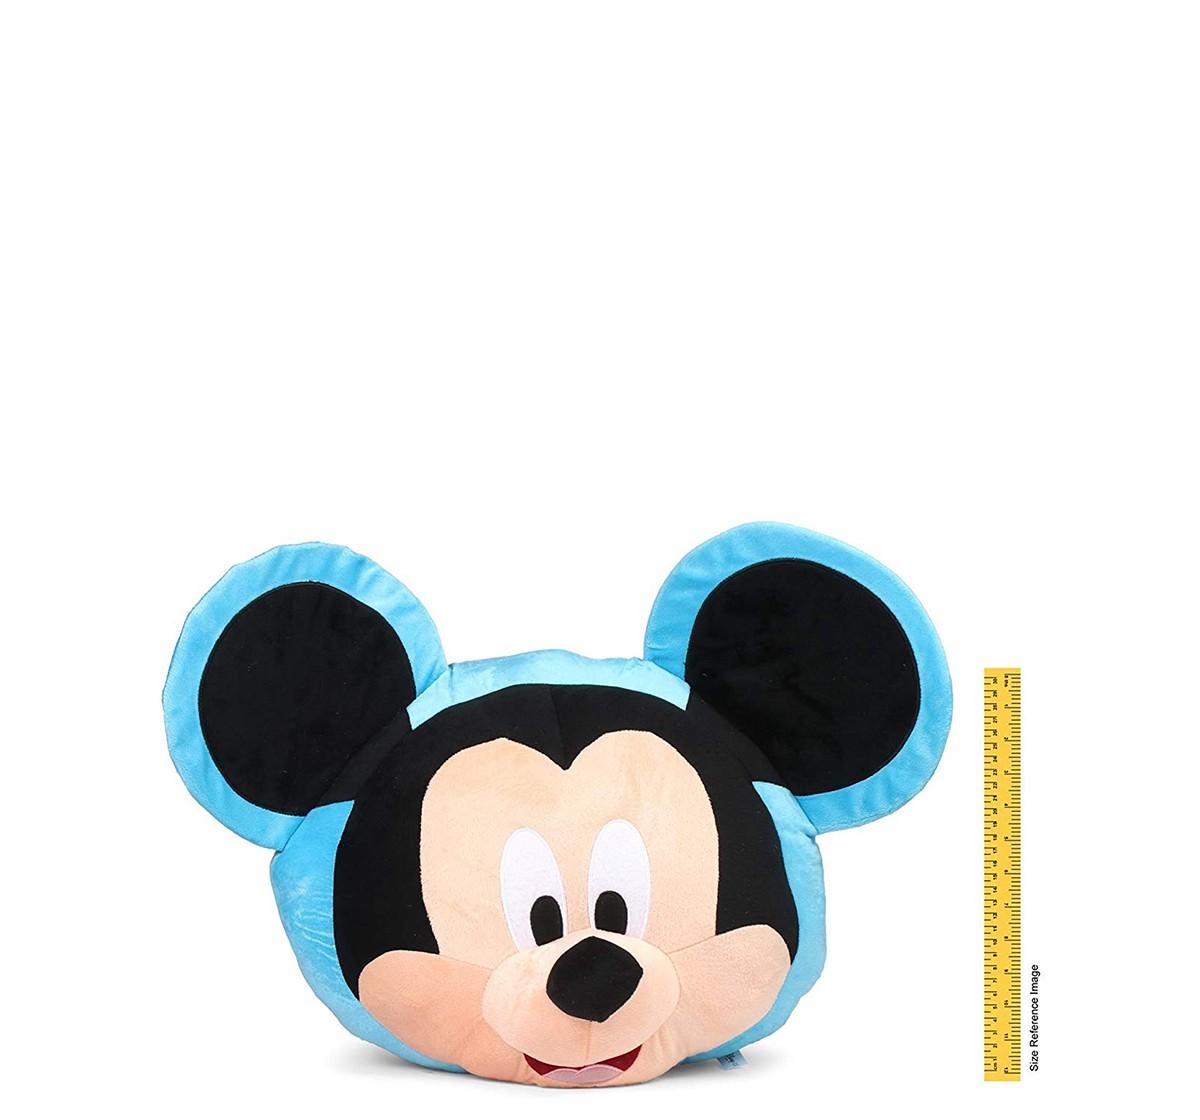 Disney Mickey Face Plush Pillow Multicolor 54 Cm for Kids age 0M+